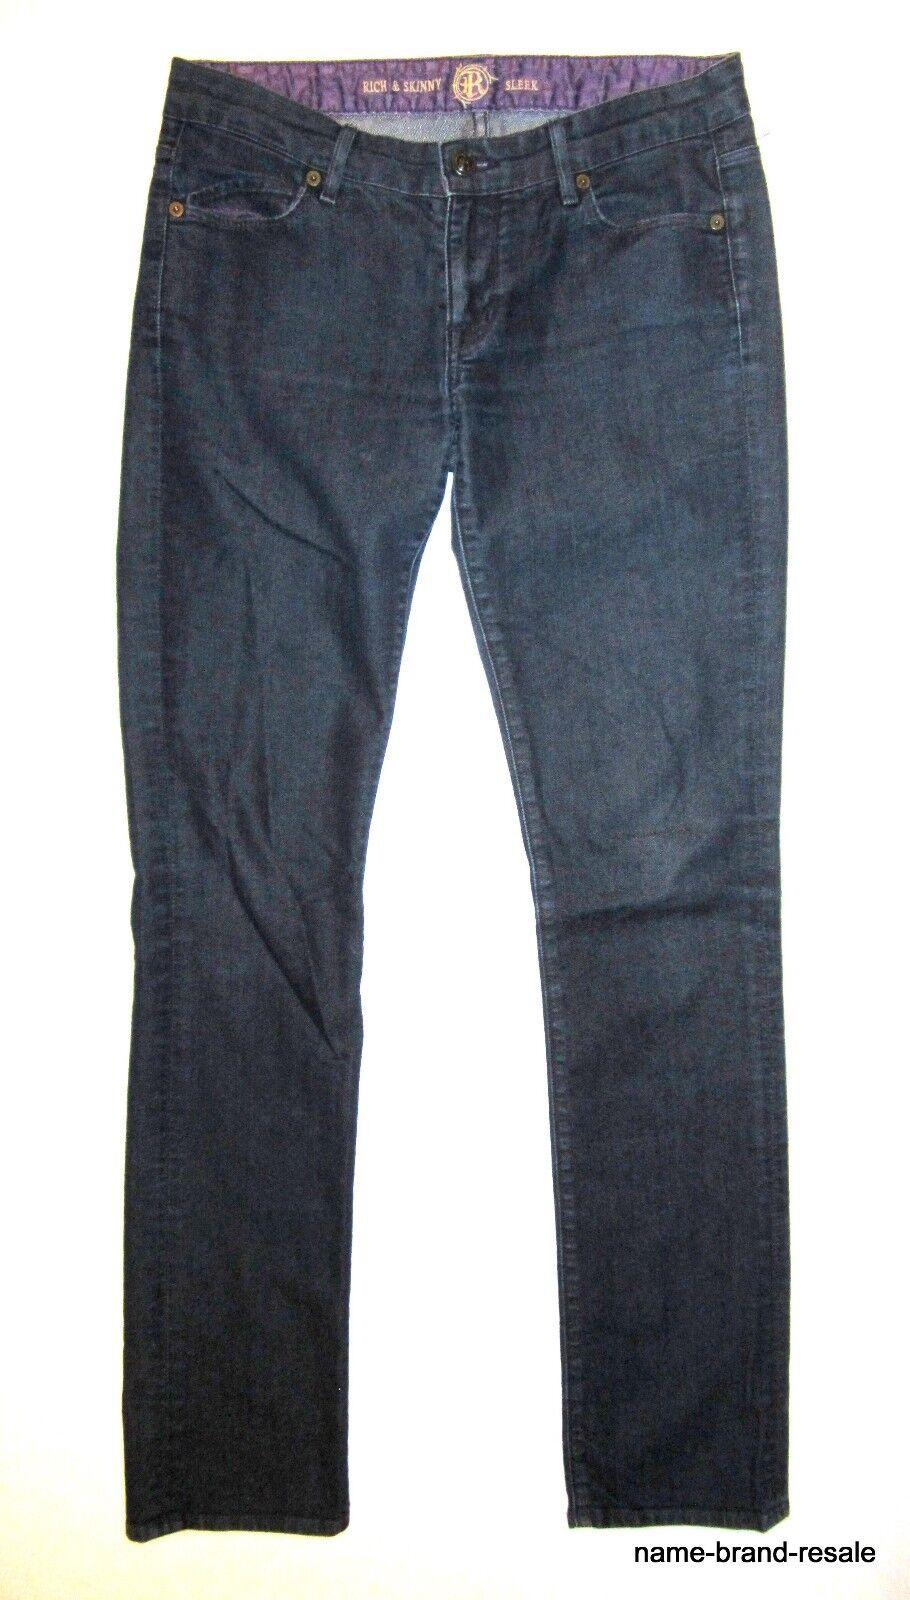 RICH & SKINNY Sleek Jeans Womens 28 Dark Denim Slim Skinny Leg Ankle Length